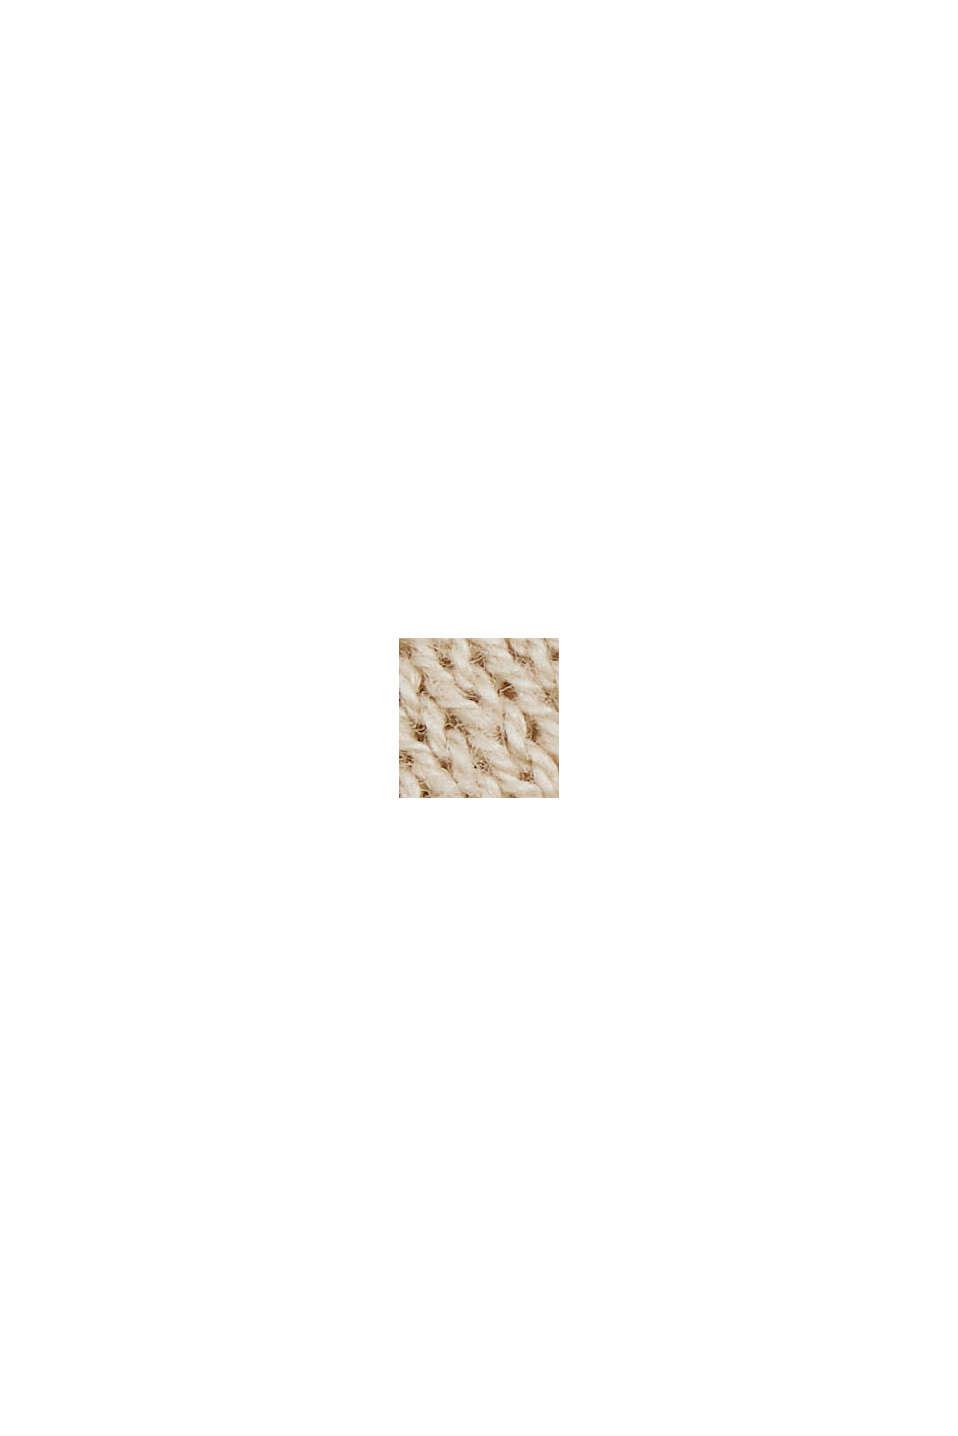 Leinen/Organic Cotton: Strick-Shirt, SAND, swatch